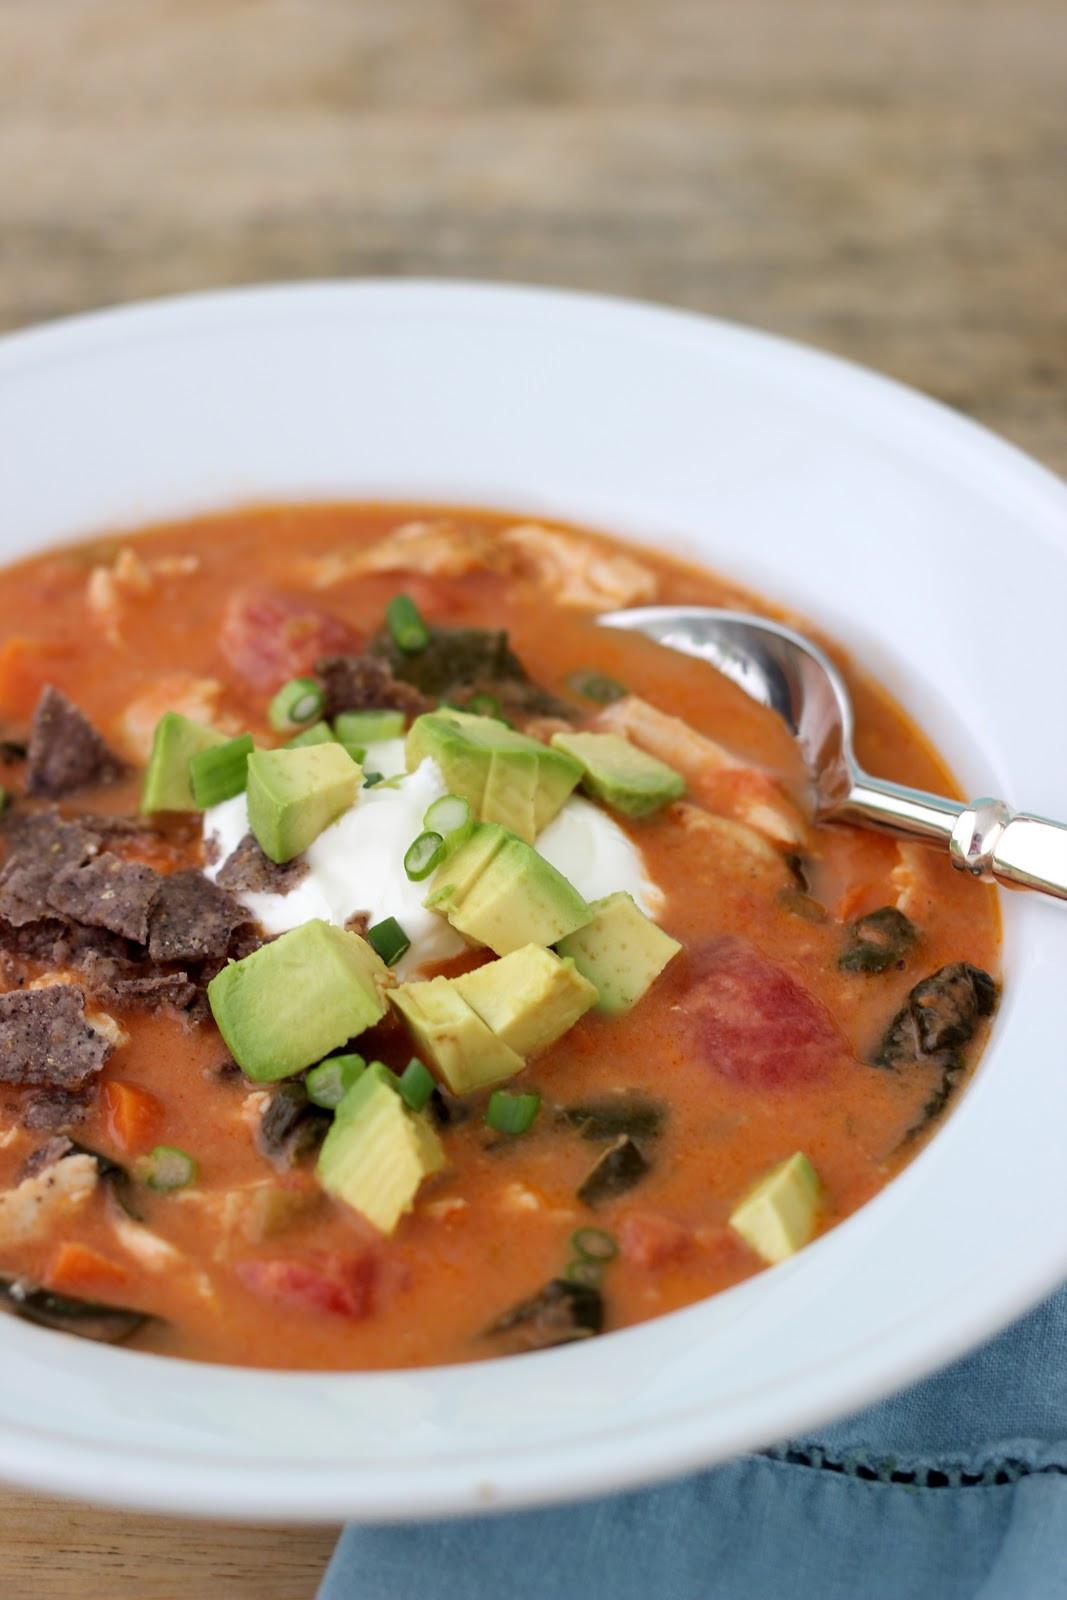 Chicken Soup Recipe Healthy  Jenny Steffens Hobick Chicken Tortilla Soup